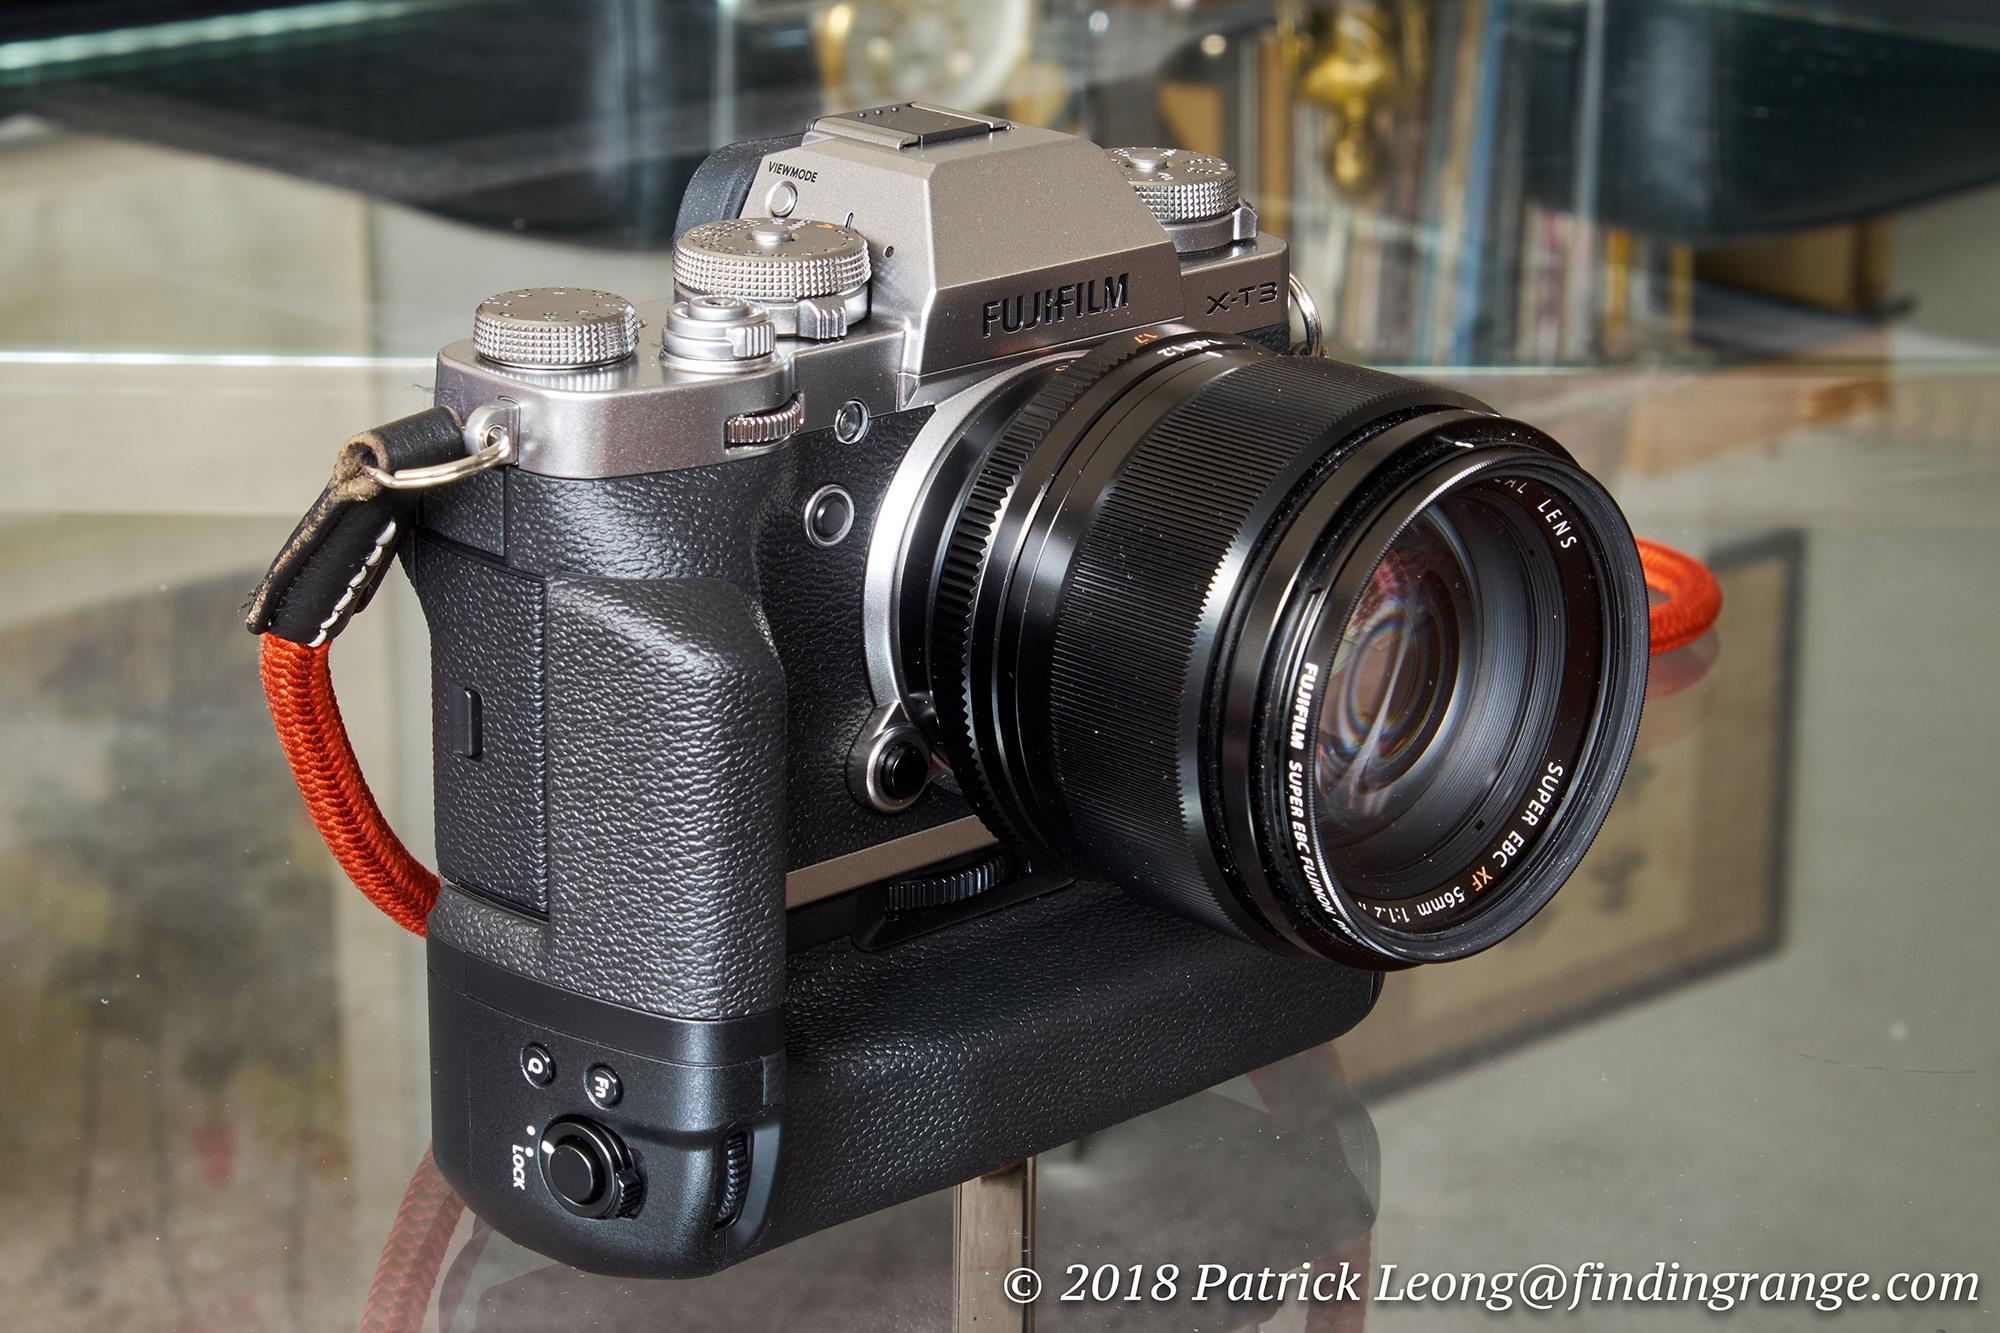 Fujifilm Vertical Battery Grip VG-XT3 Review